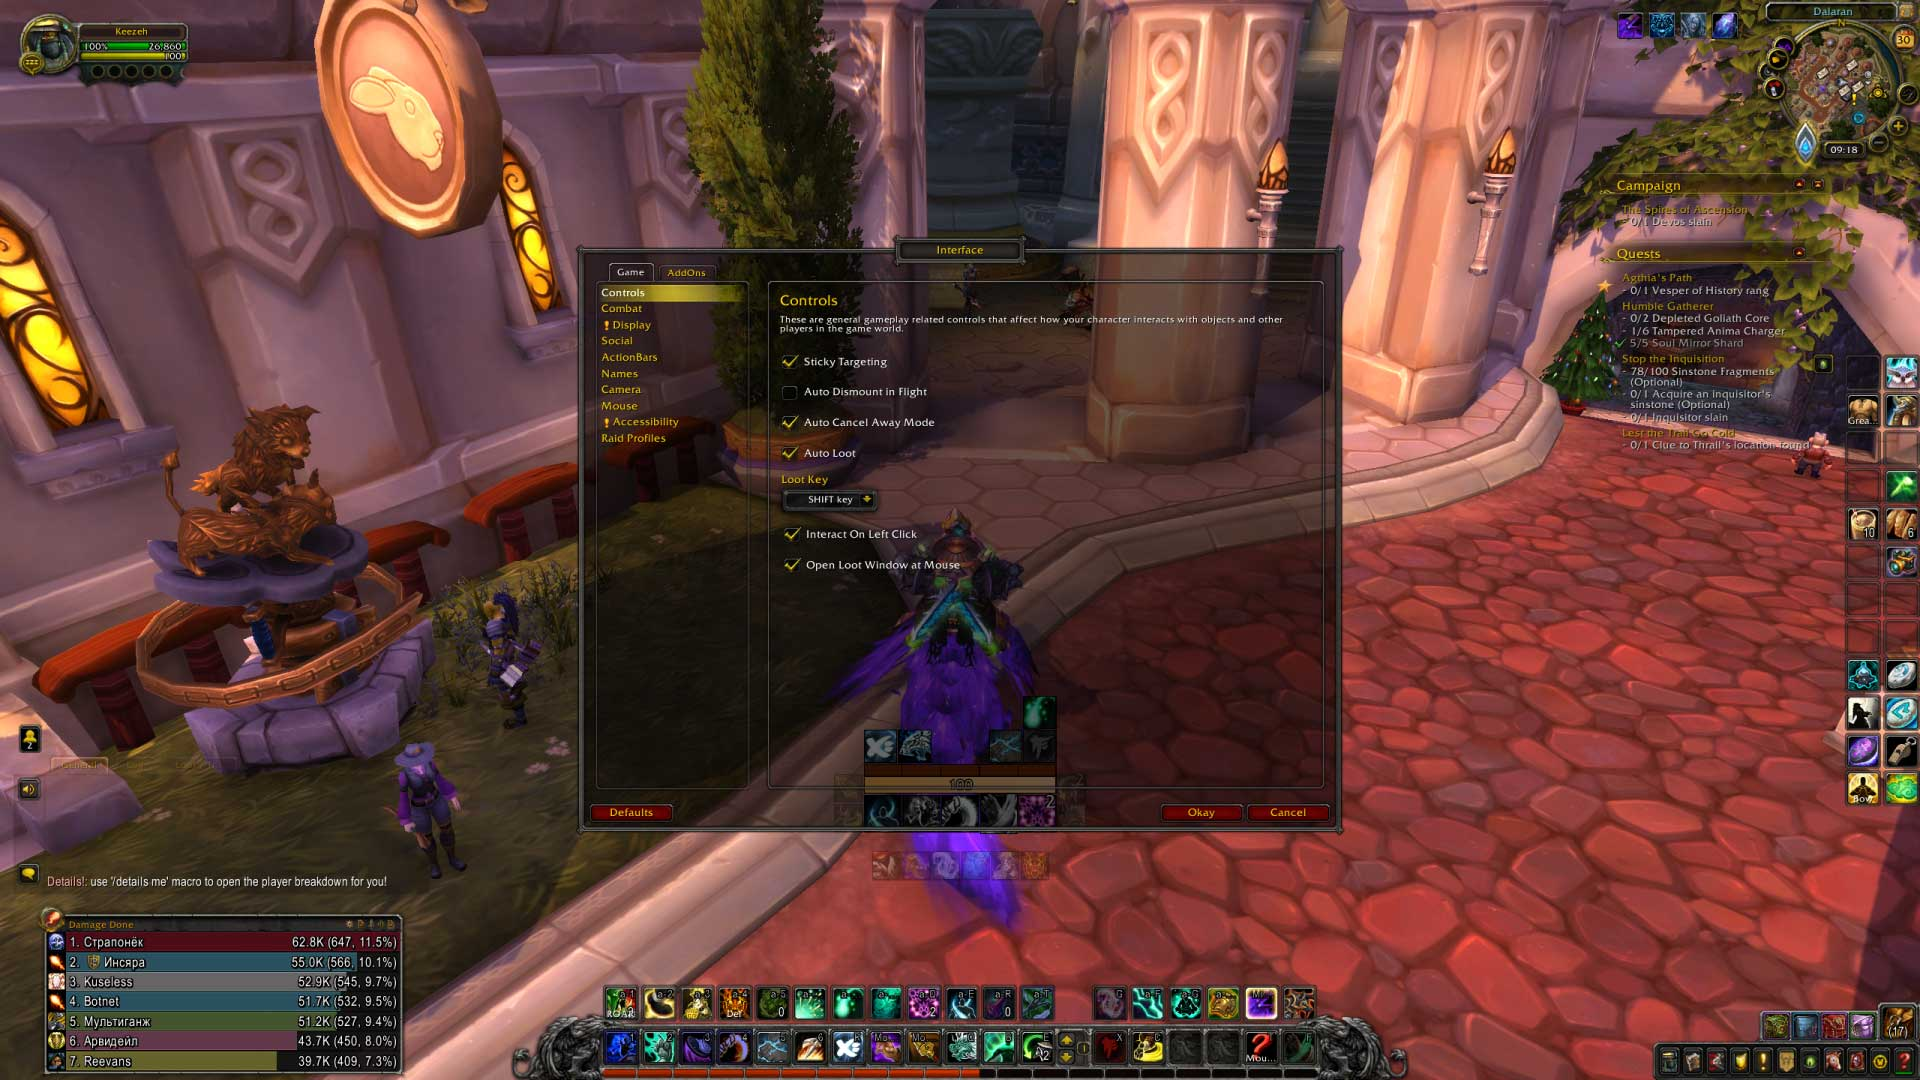 World-of-Warcraft-Ustawienia-interfejsu-1